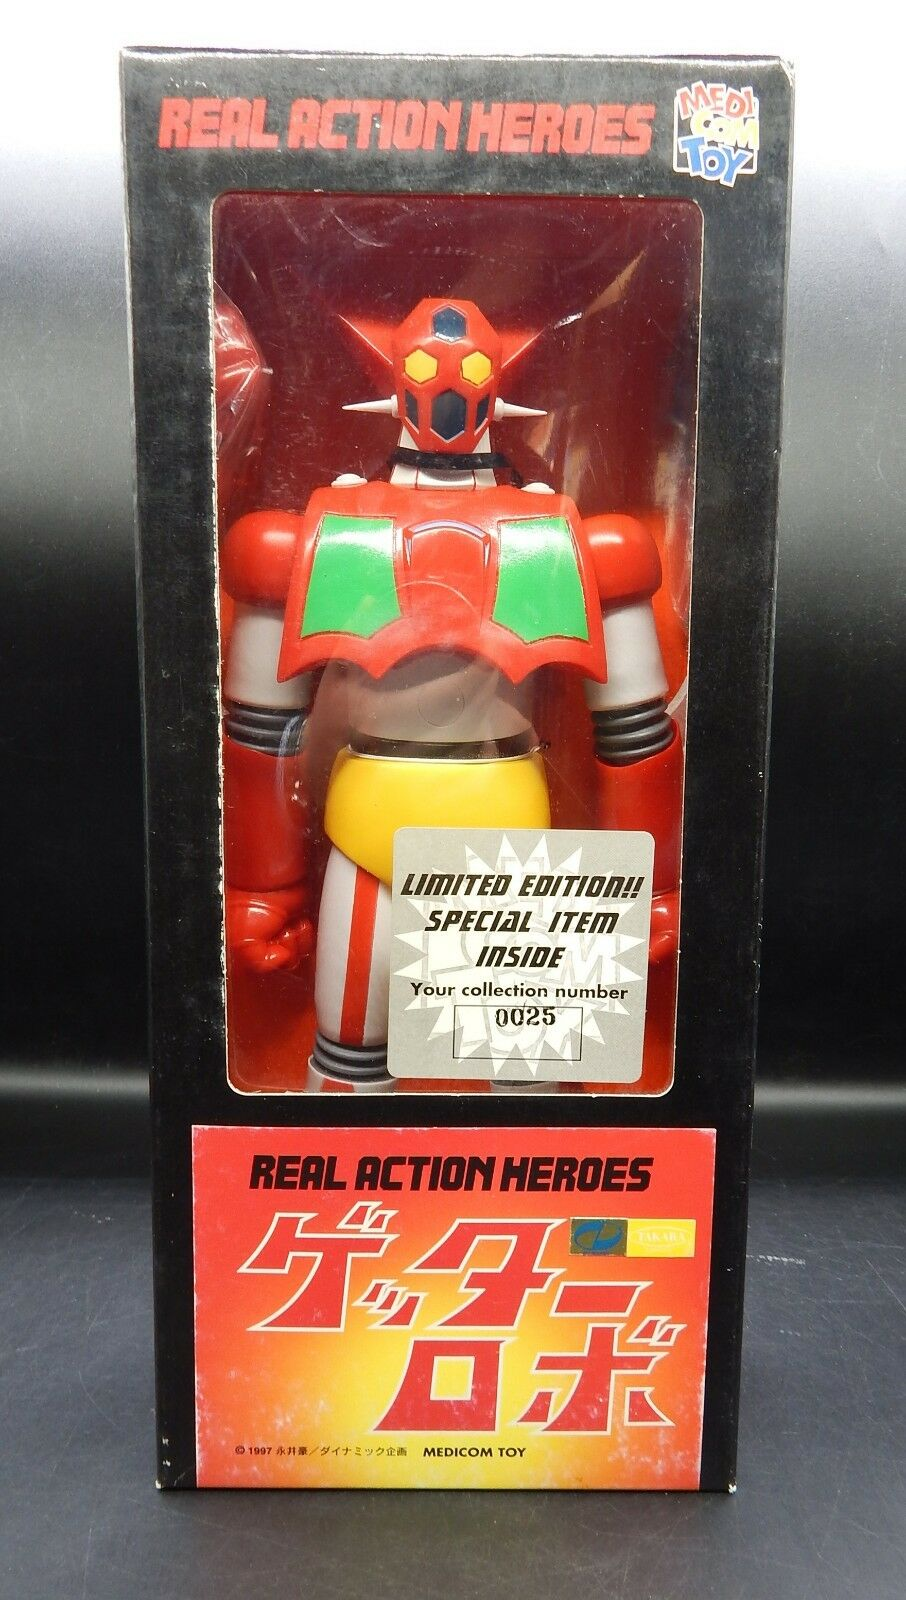 1997 Medicom toy RAH Getter Robo Getta 1 limited version 12  action figure ROBOT